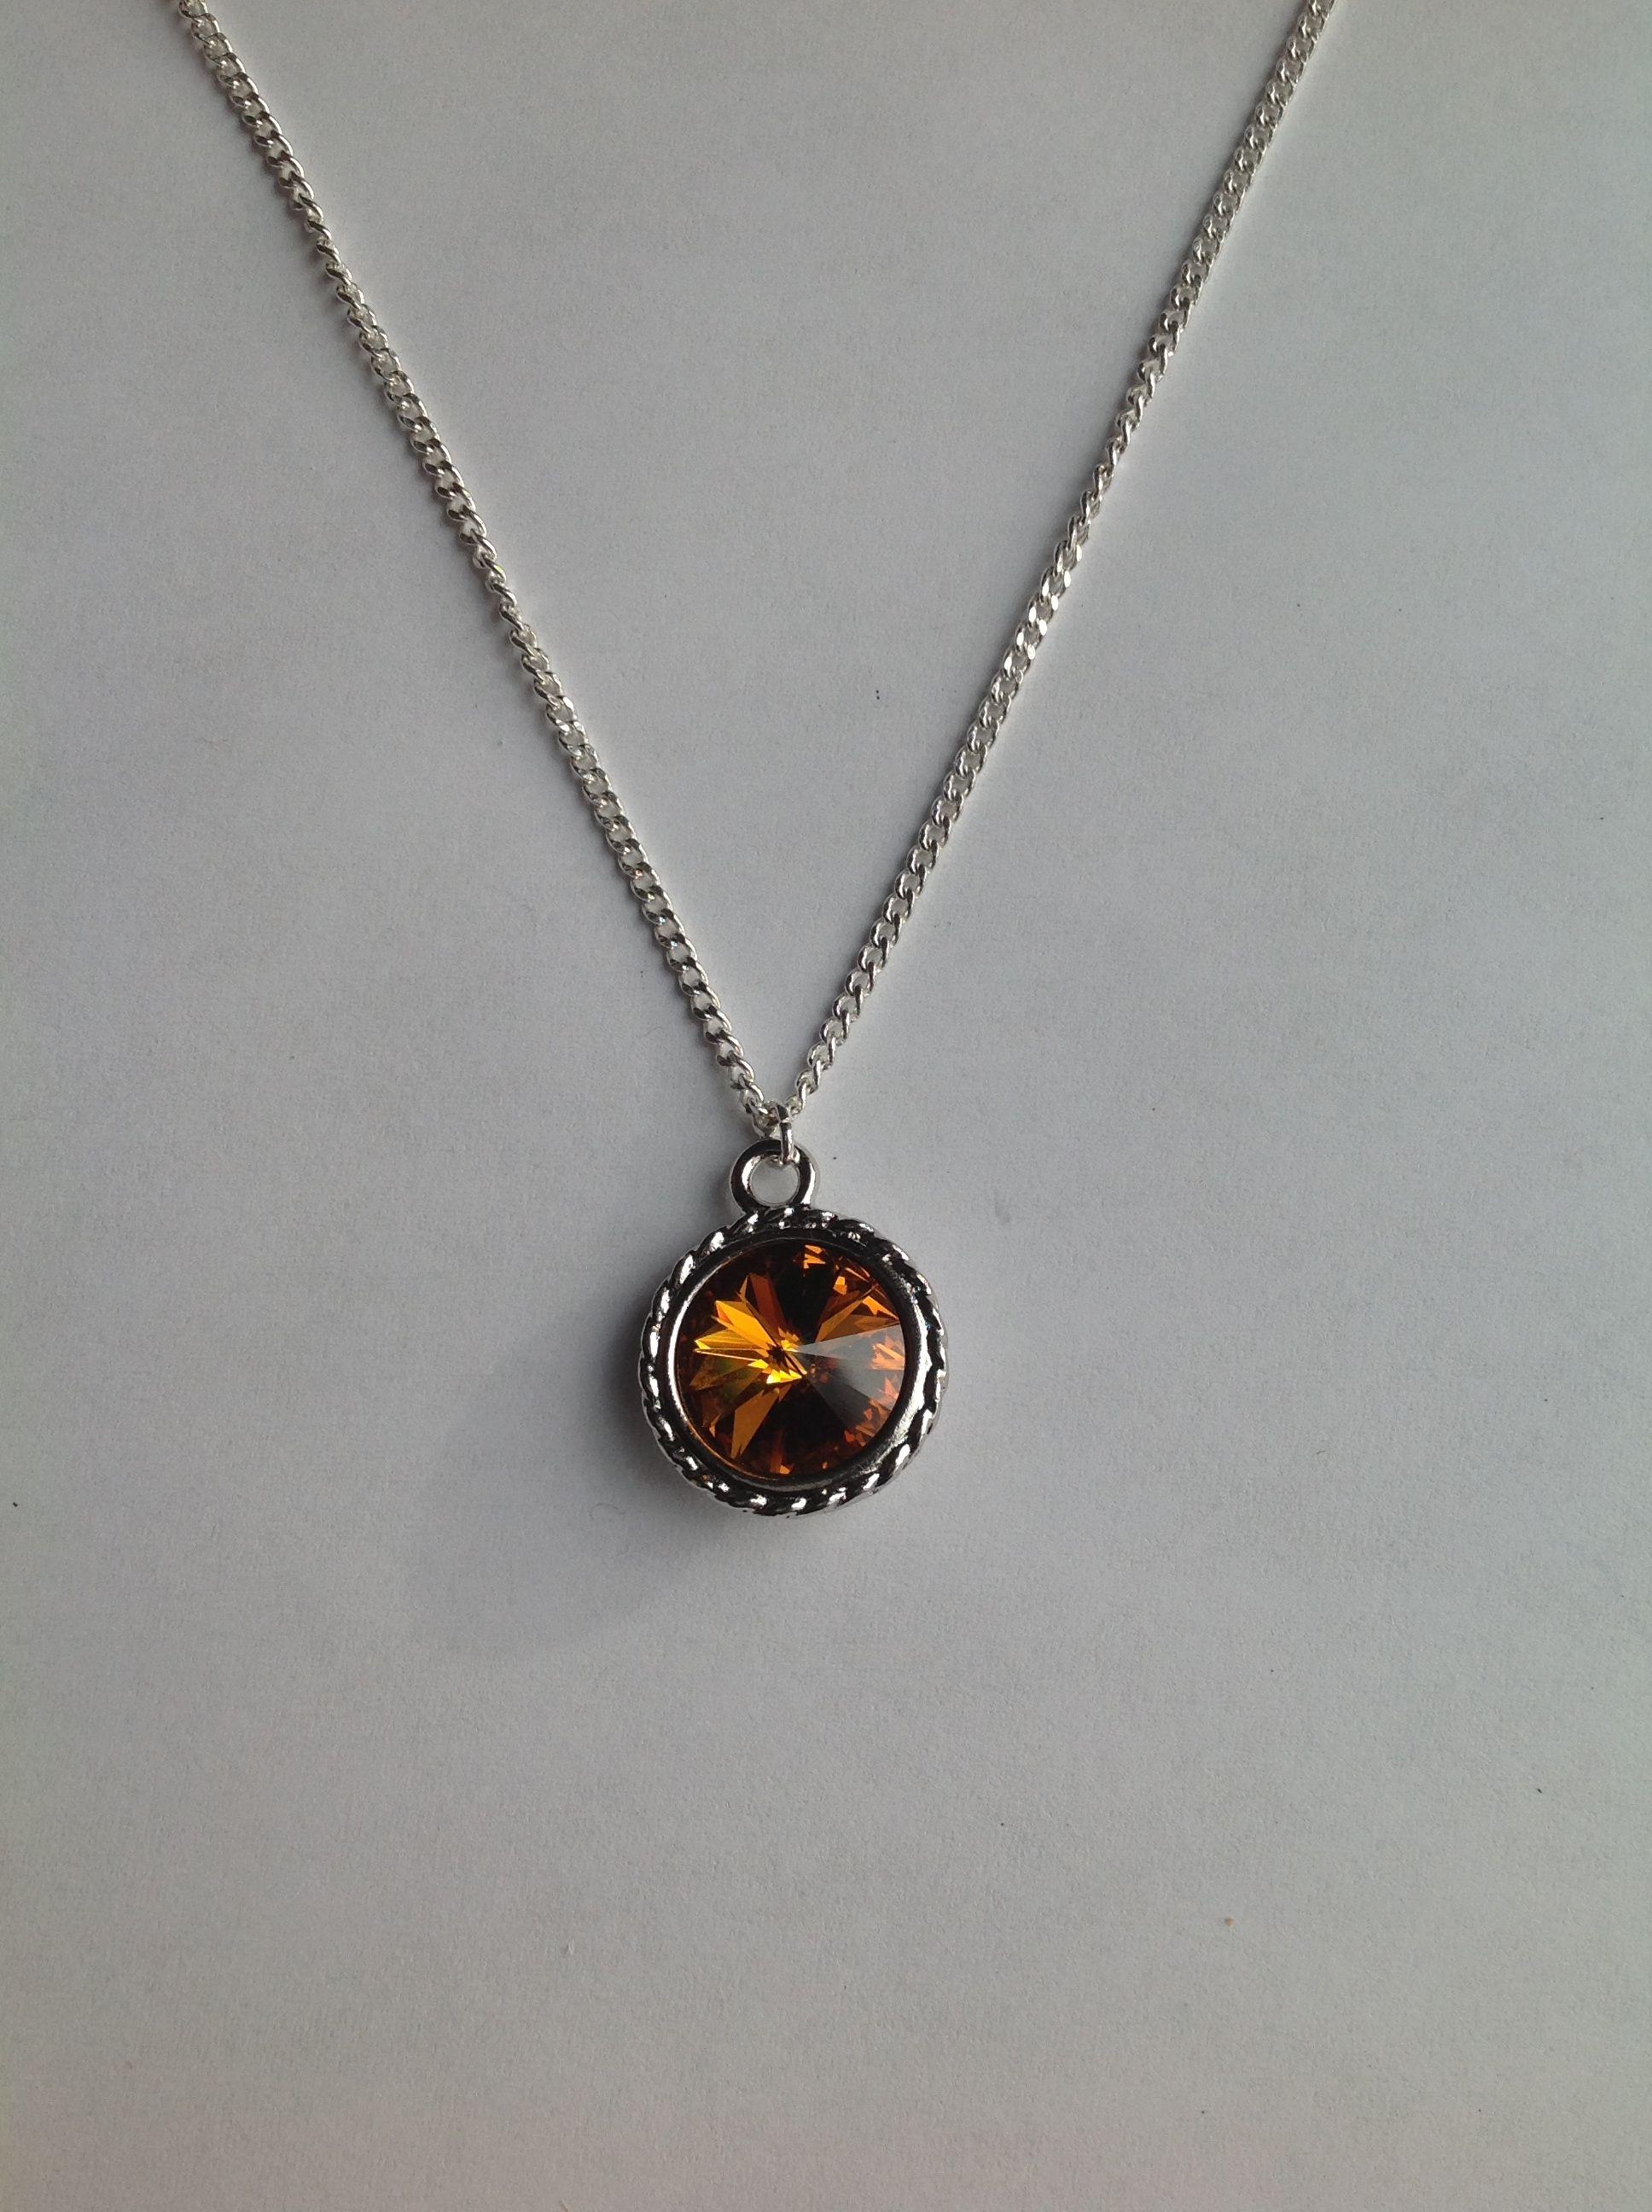 Swarovski Birthstone Pendant Necklace. November